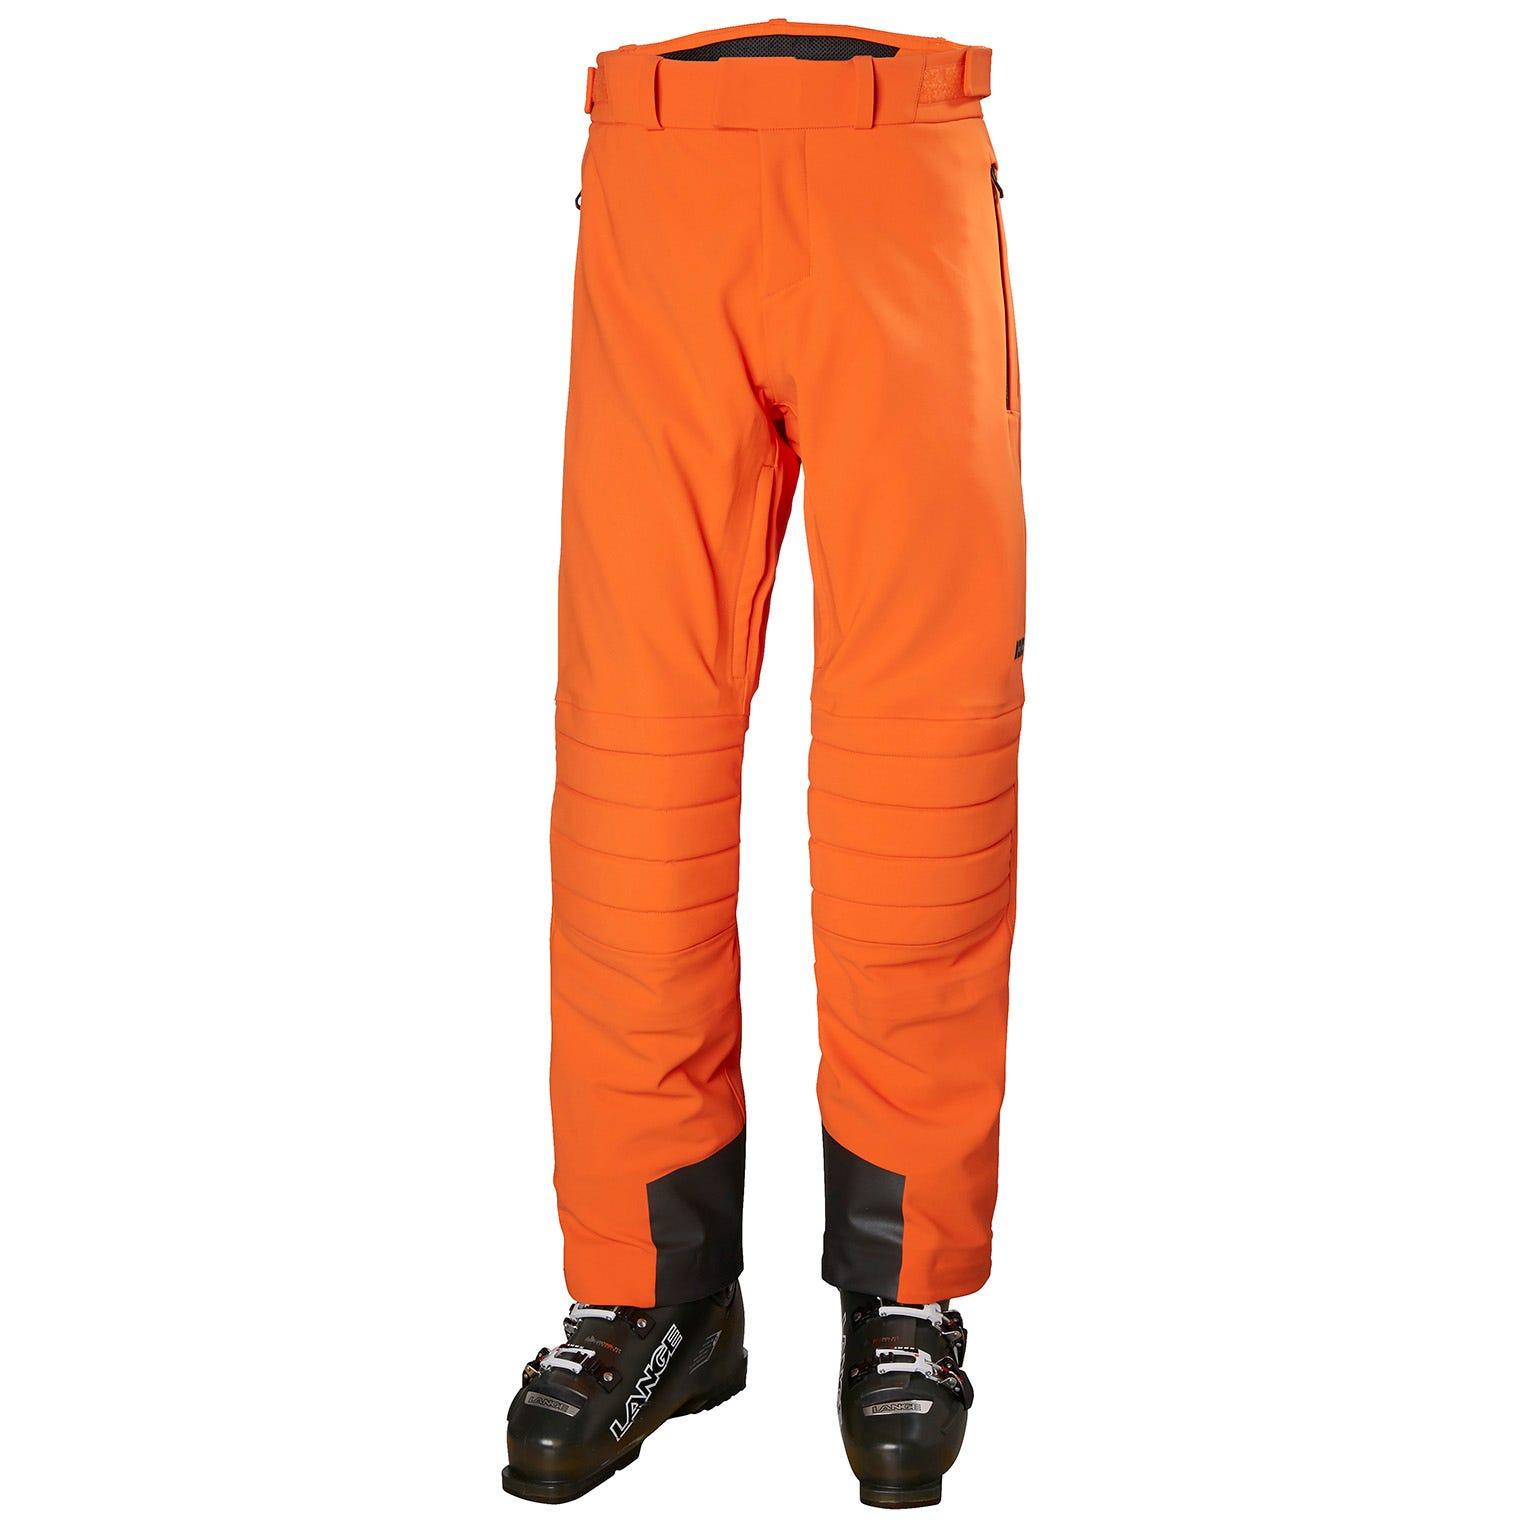 Helly Hansen Mens Russi Softshell Stretch Ski Trousers Orange XL